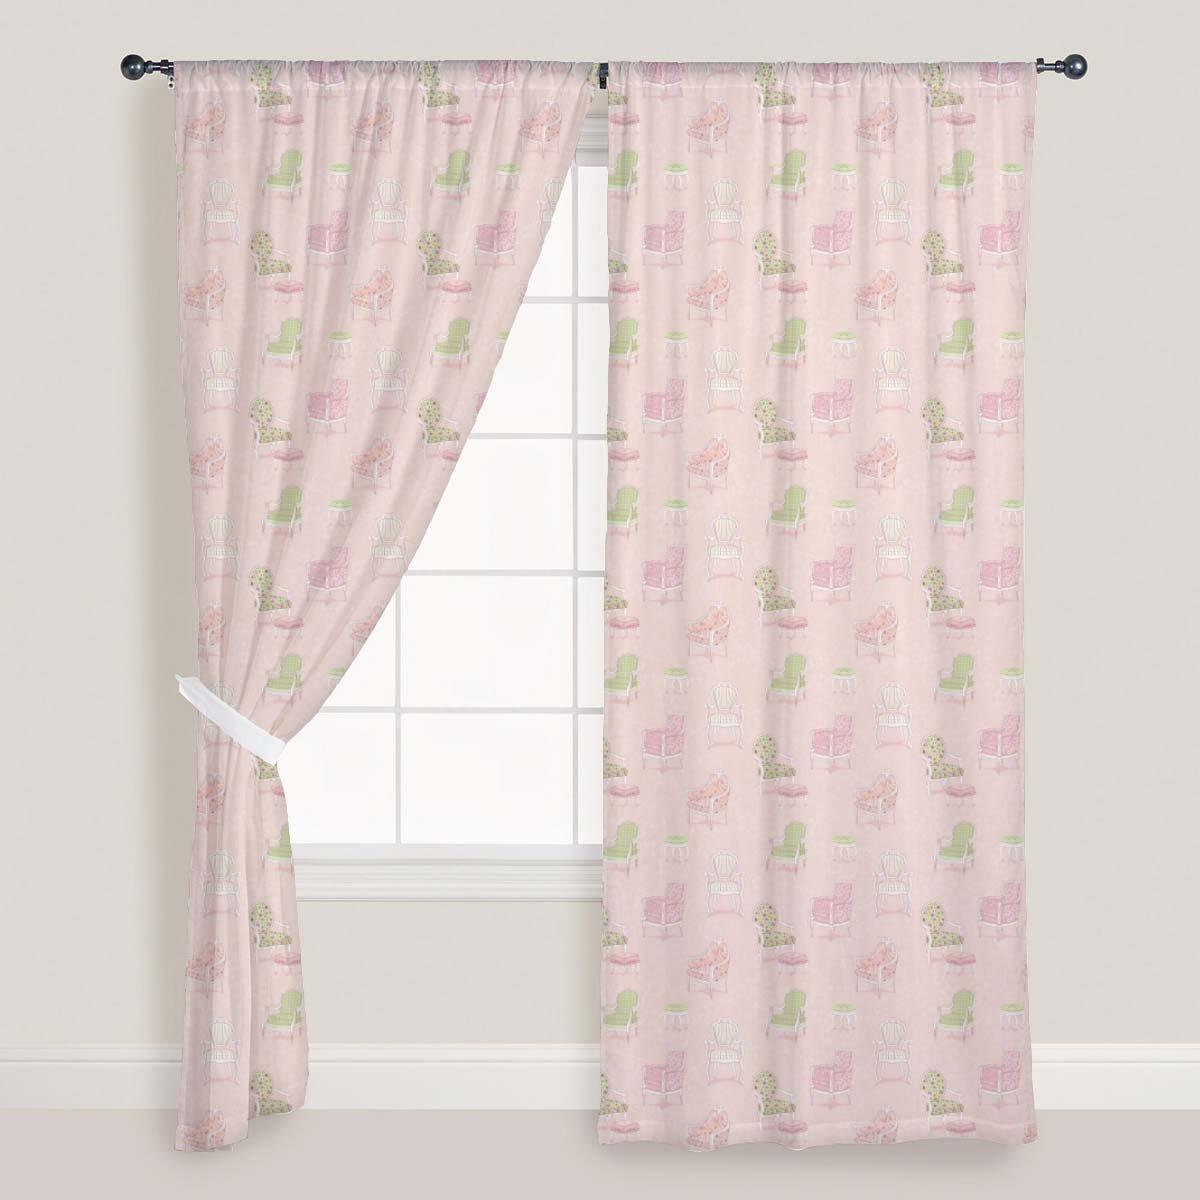 AZ Antique Armchairs Door & Window Curtain Satin 4feet x 10feet; SET OF 2 PCS